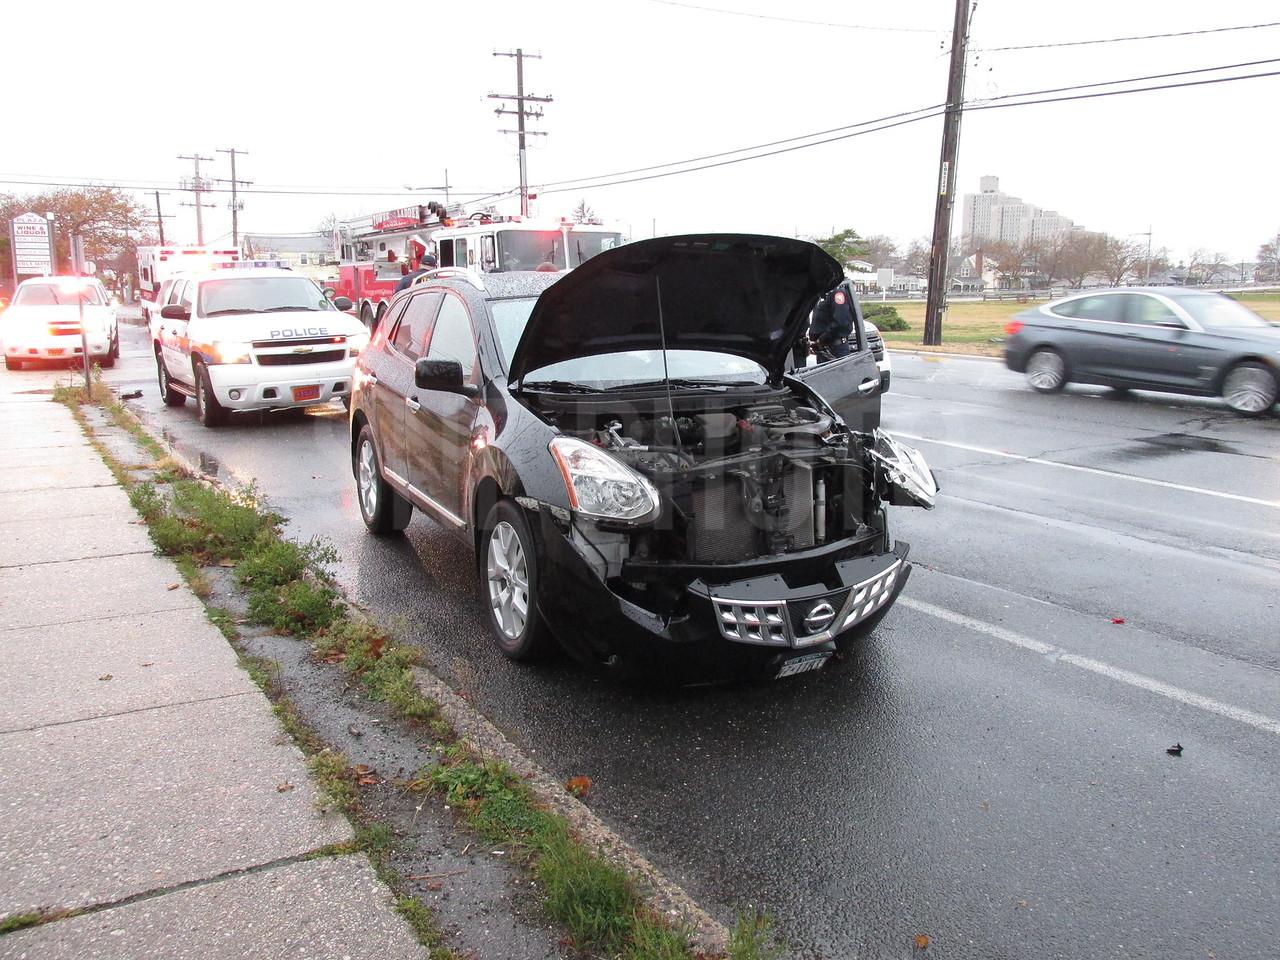 The SUV sustained minor damage.